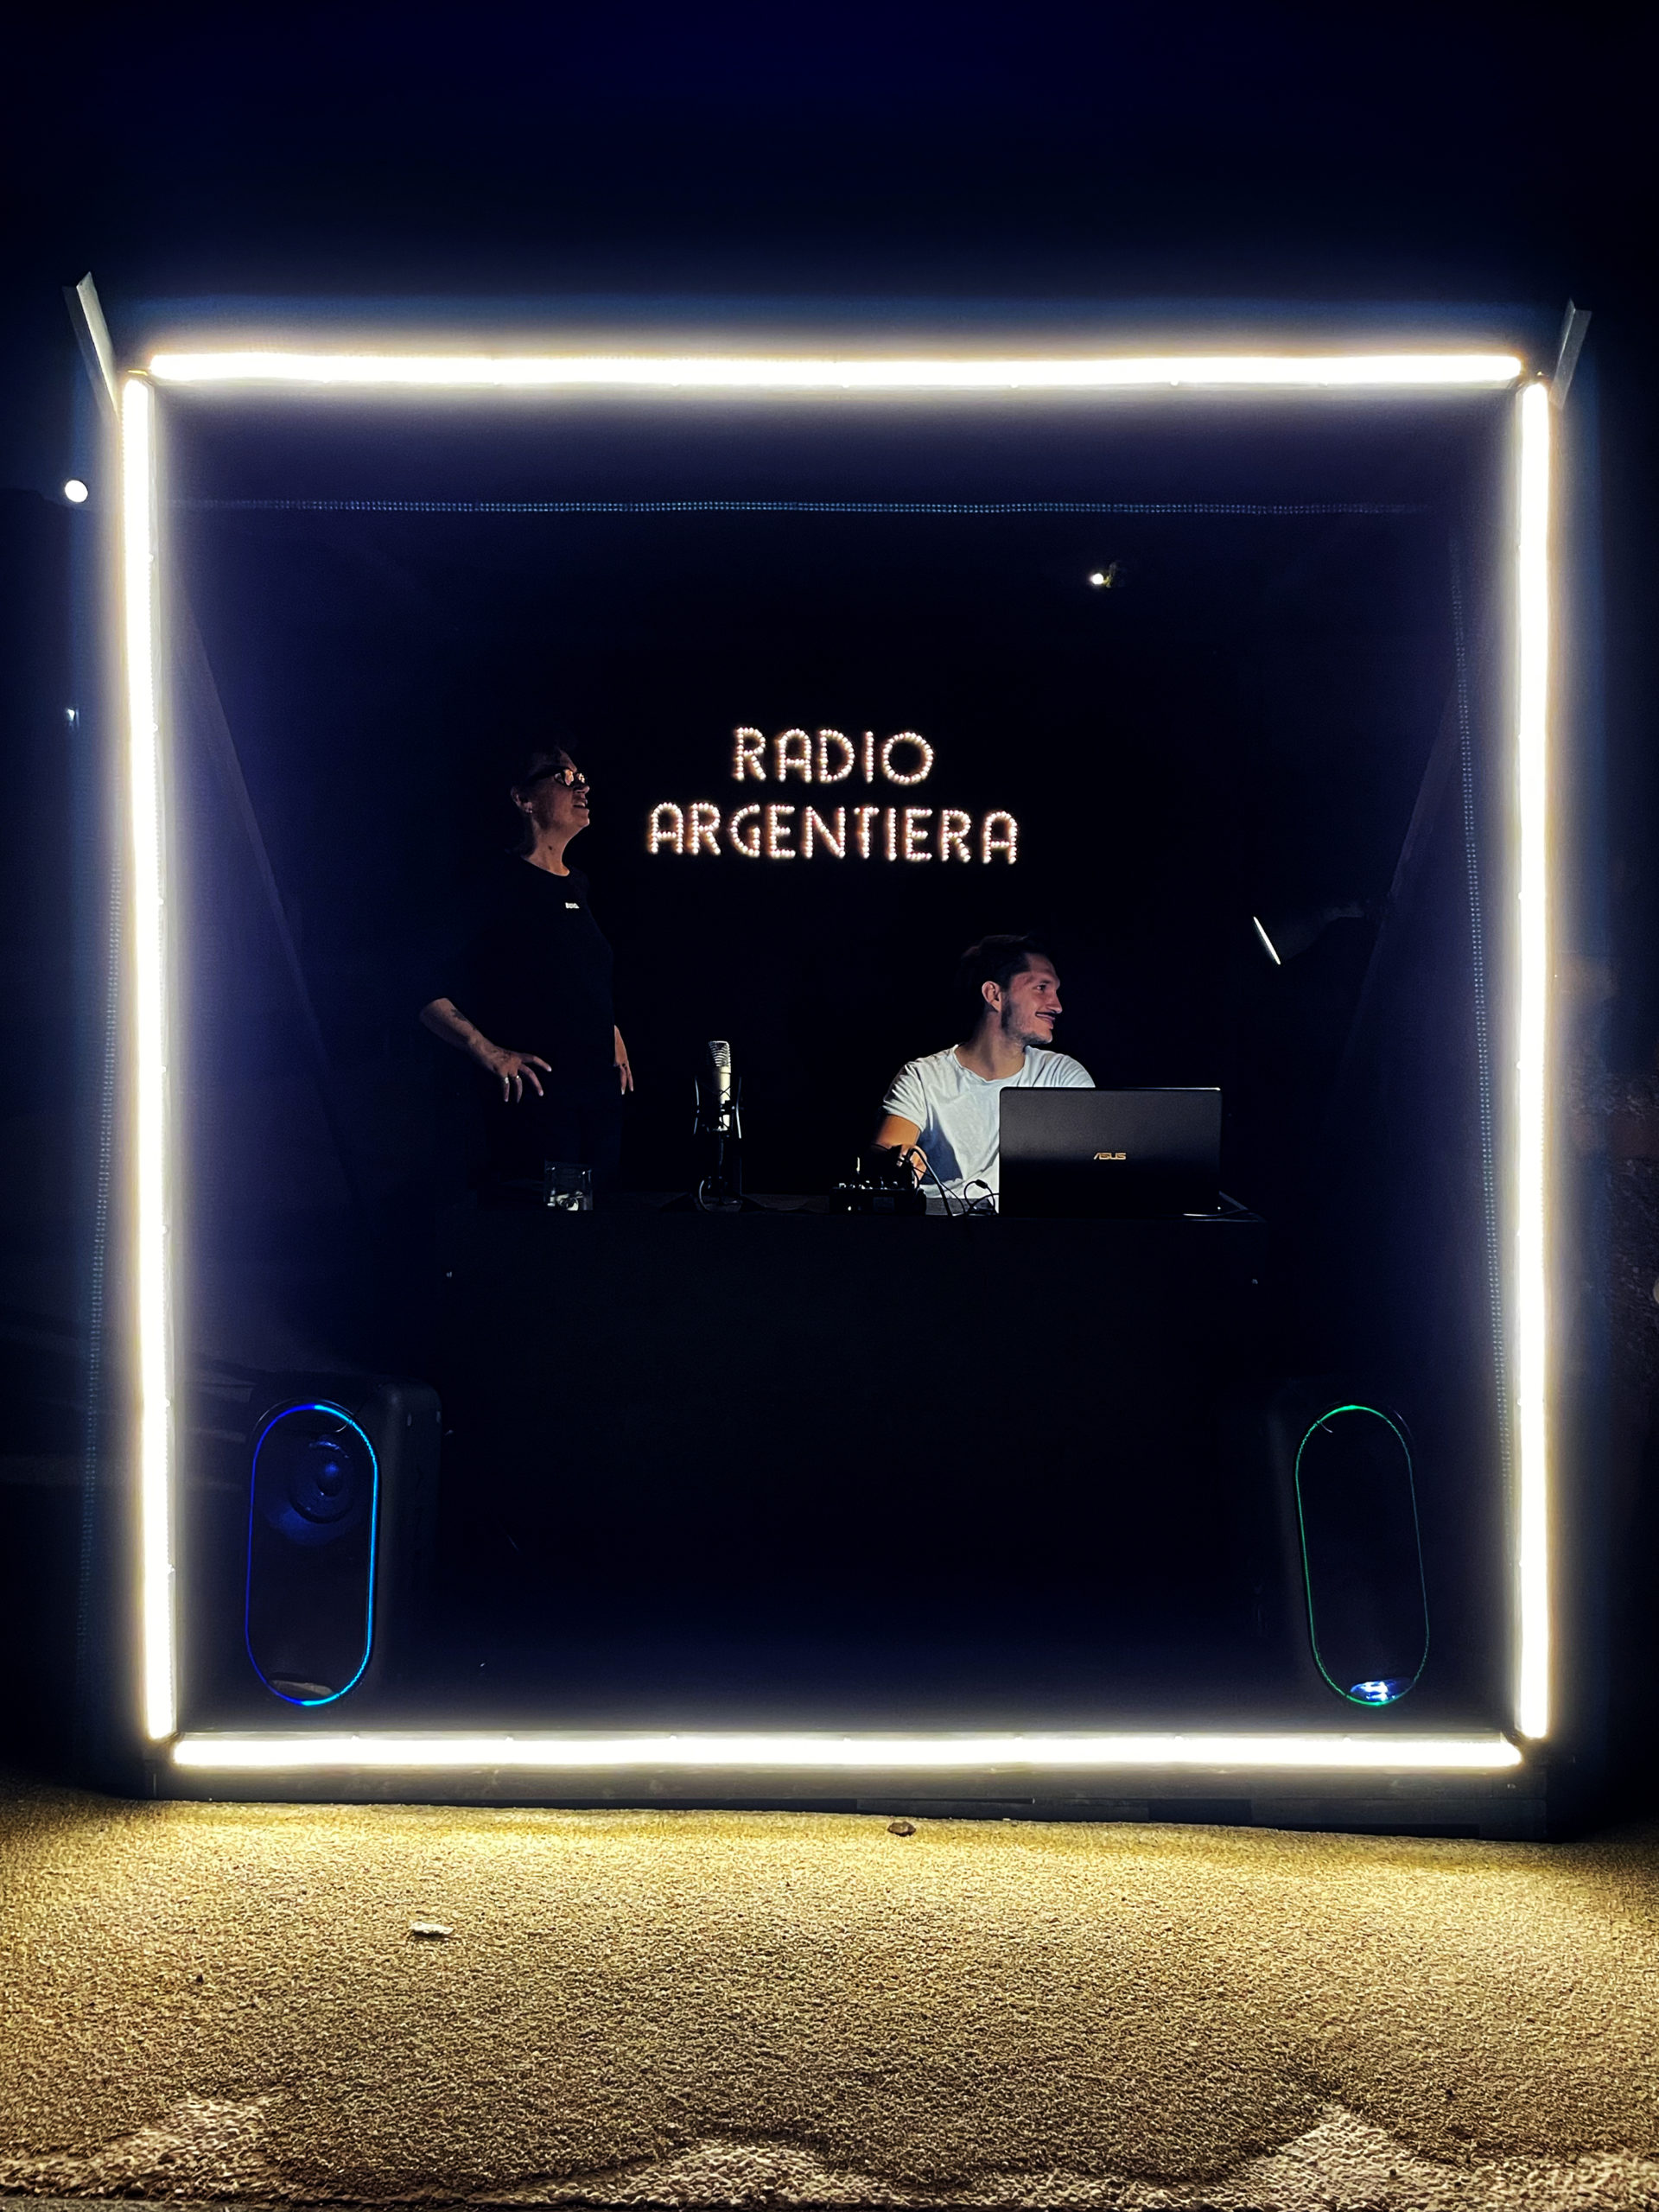 Radio Argentiera